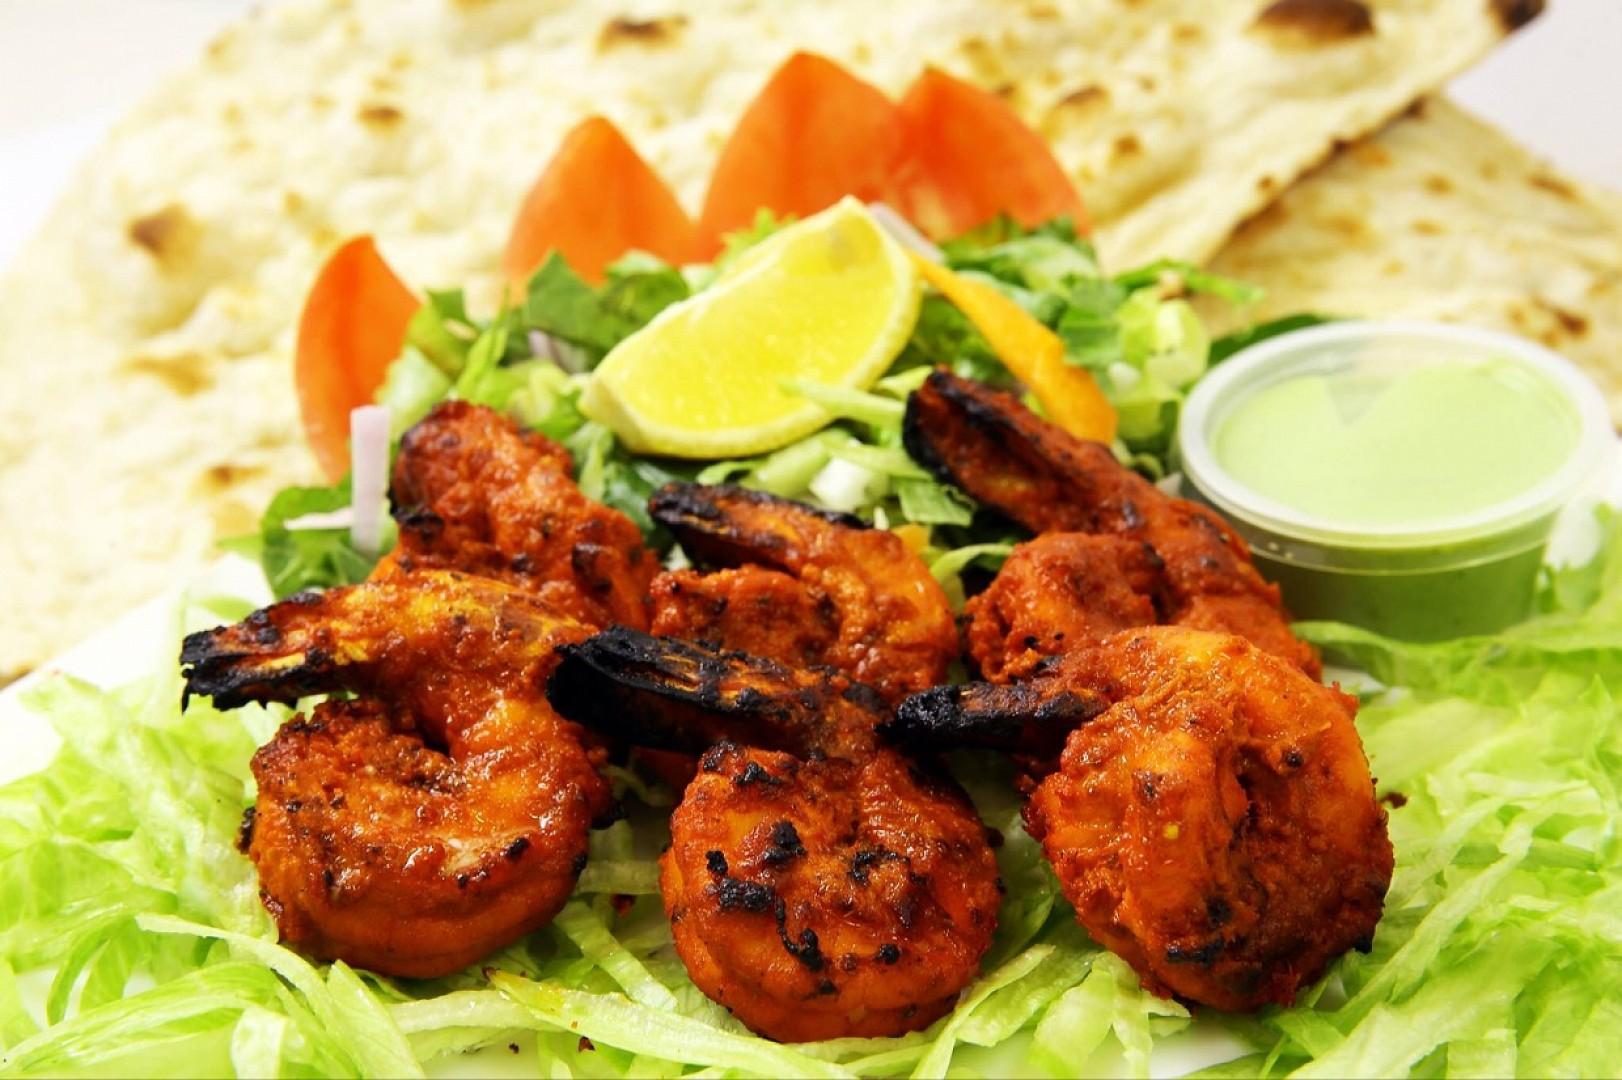 Mouth watering tandoori prawns @ Shawarma Lounge - Bahrain